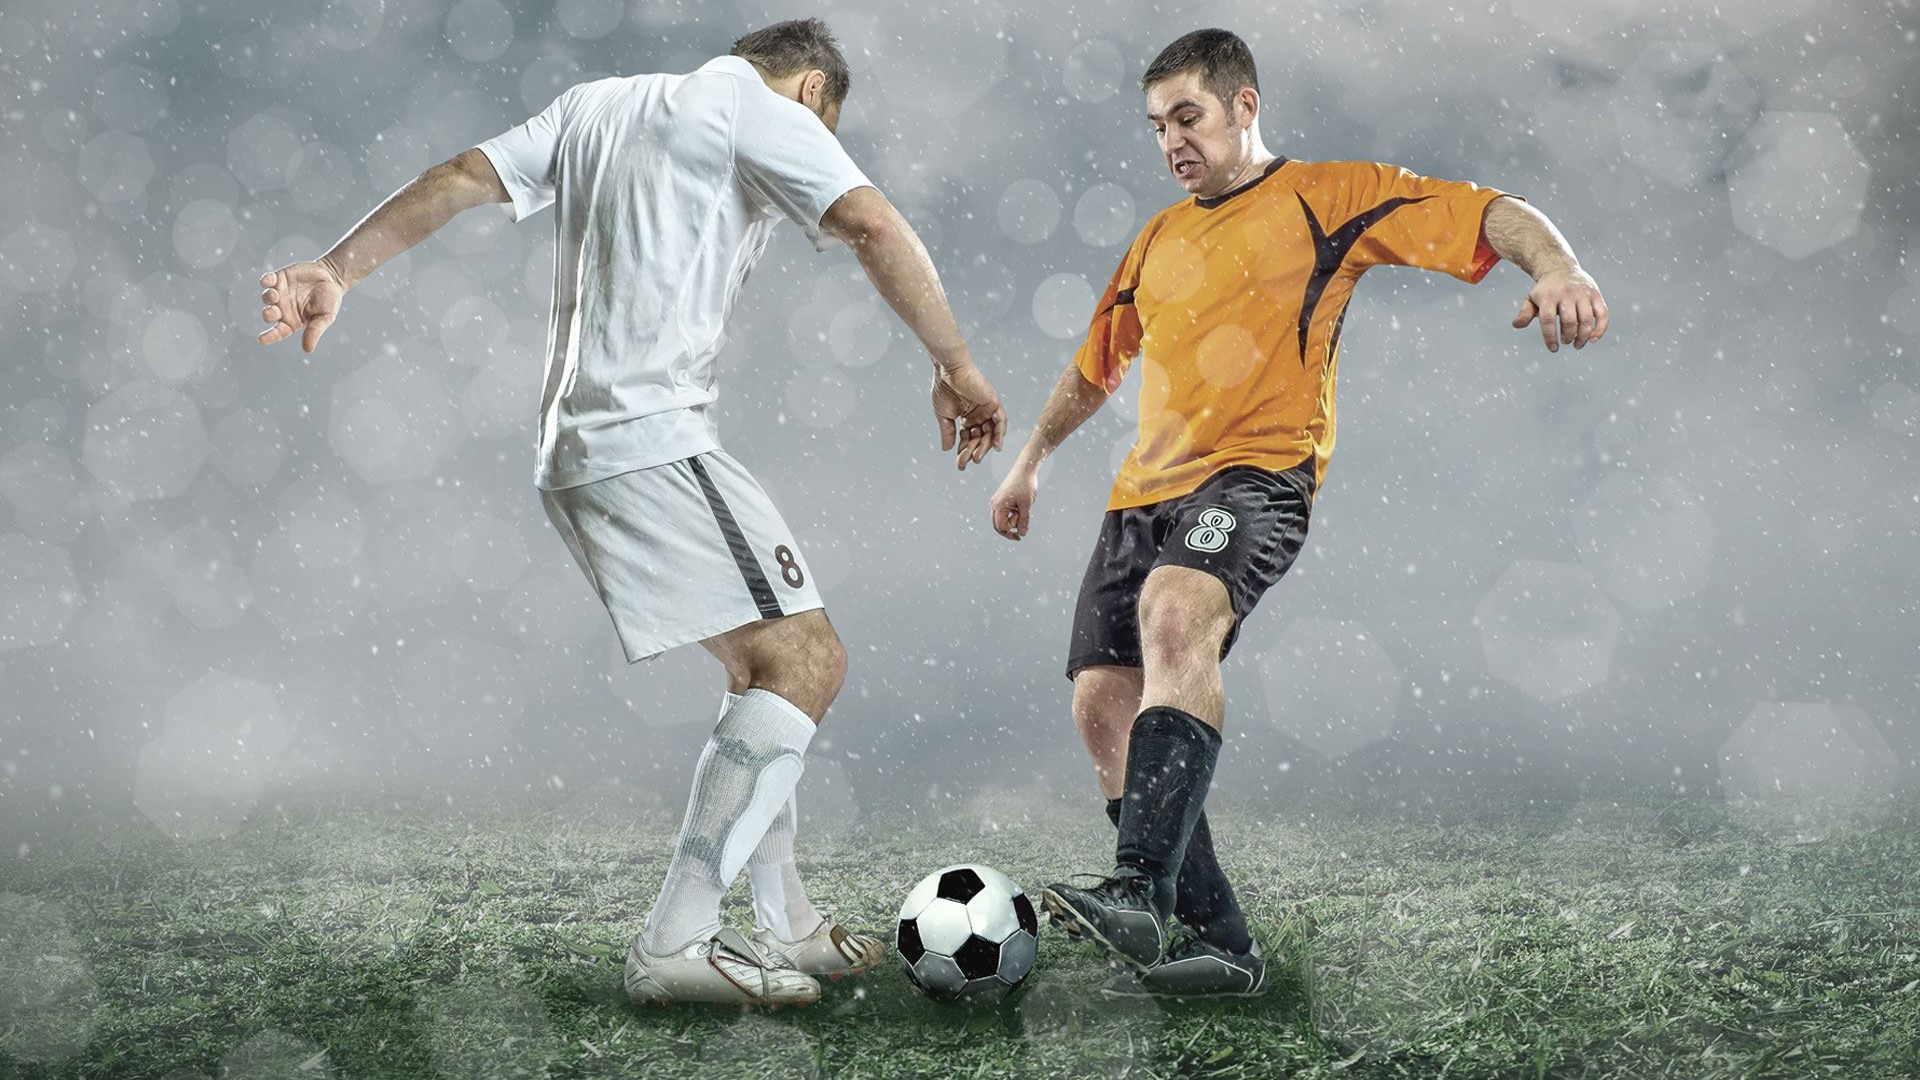 toulon-vs-clermont-auvergne-rugby-live